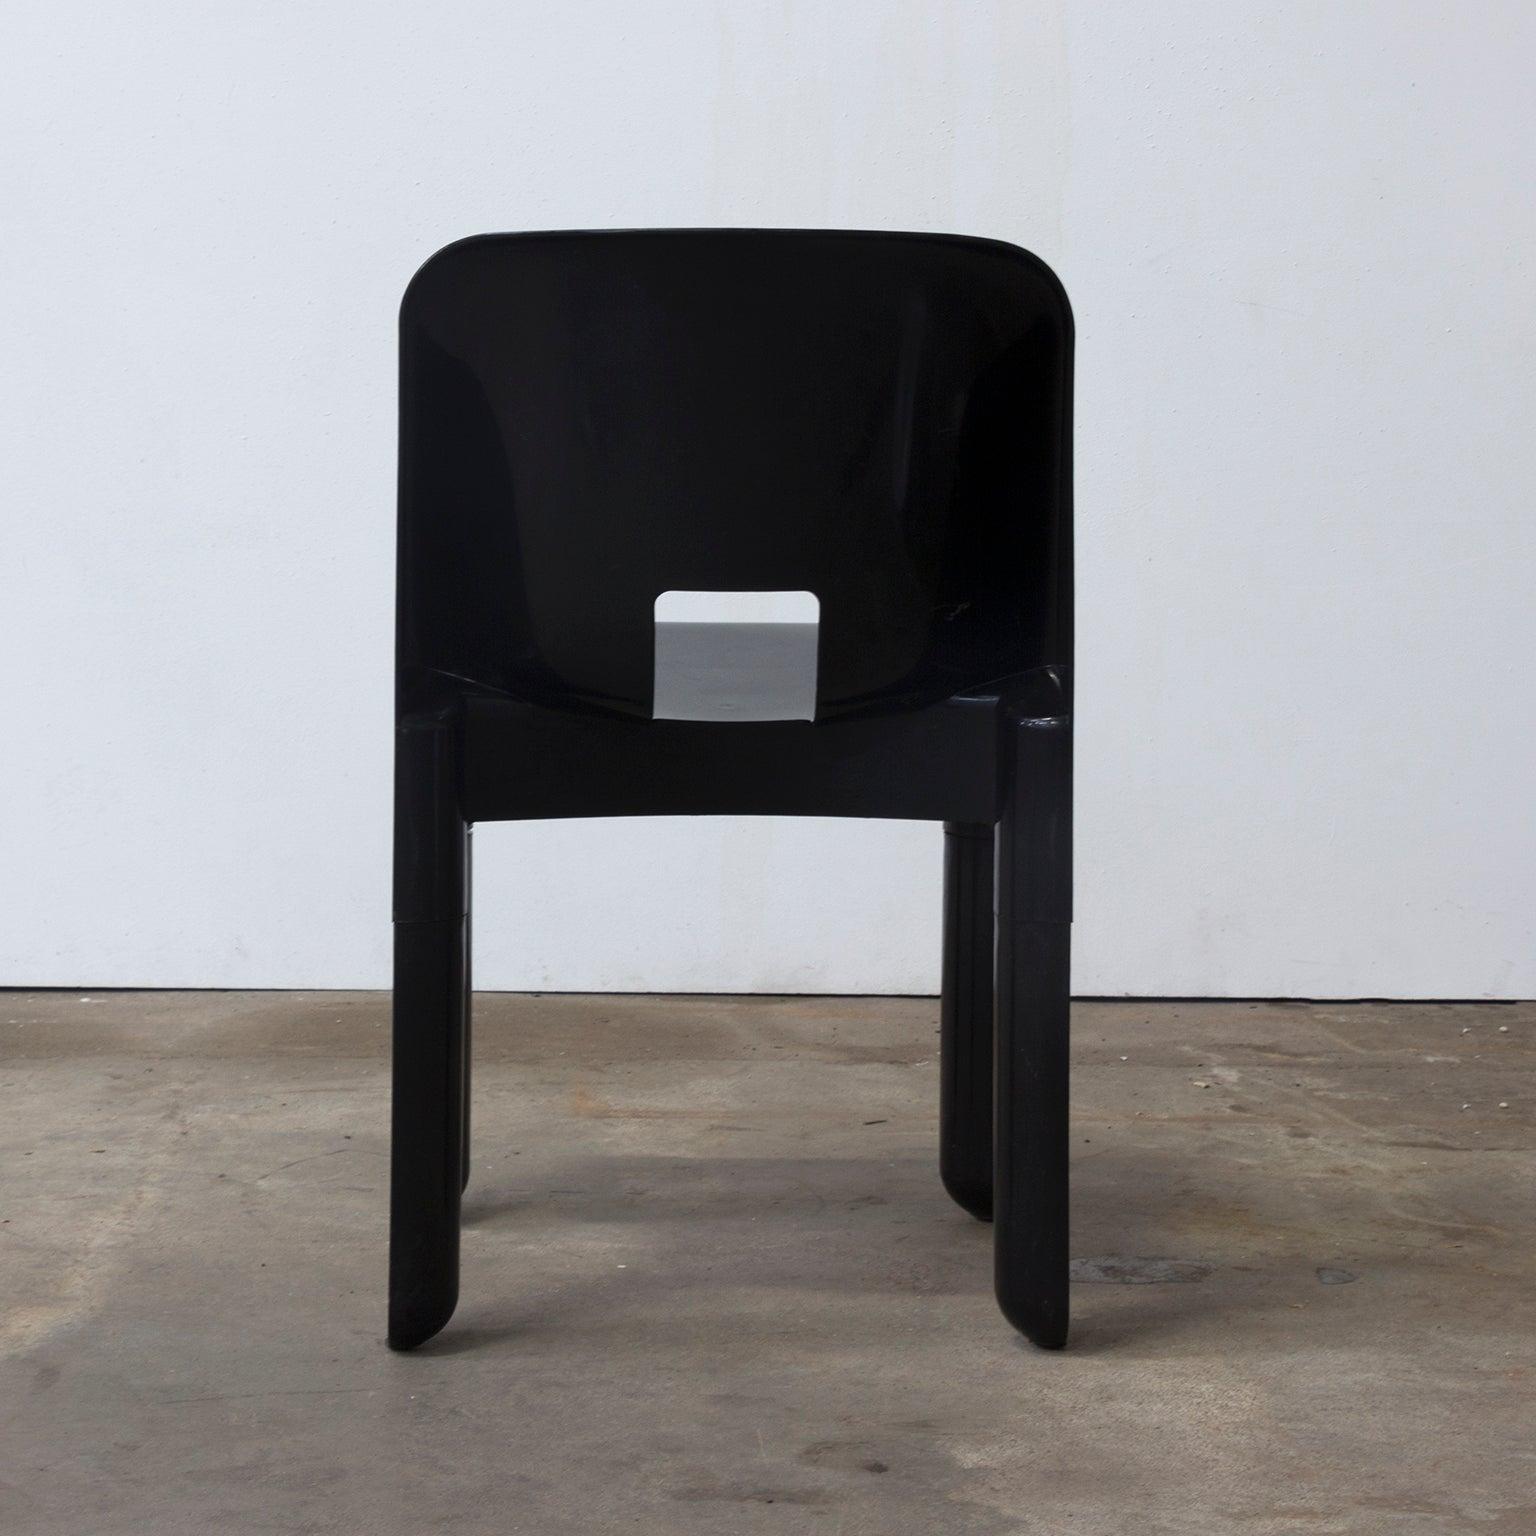 Design Stoelen Kartell.1967 Joe Colombo Universale Plastic Chair Type 4867 Three Pieces In Black